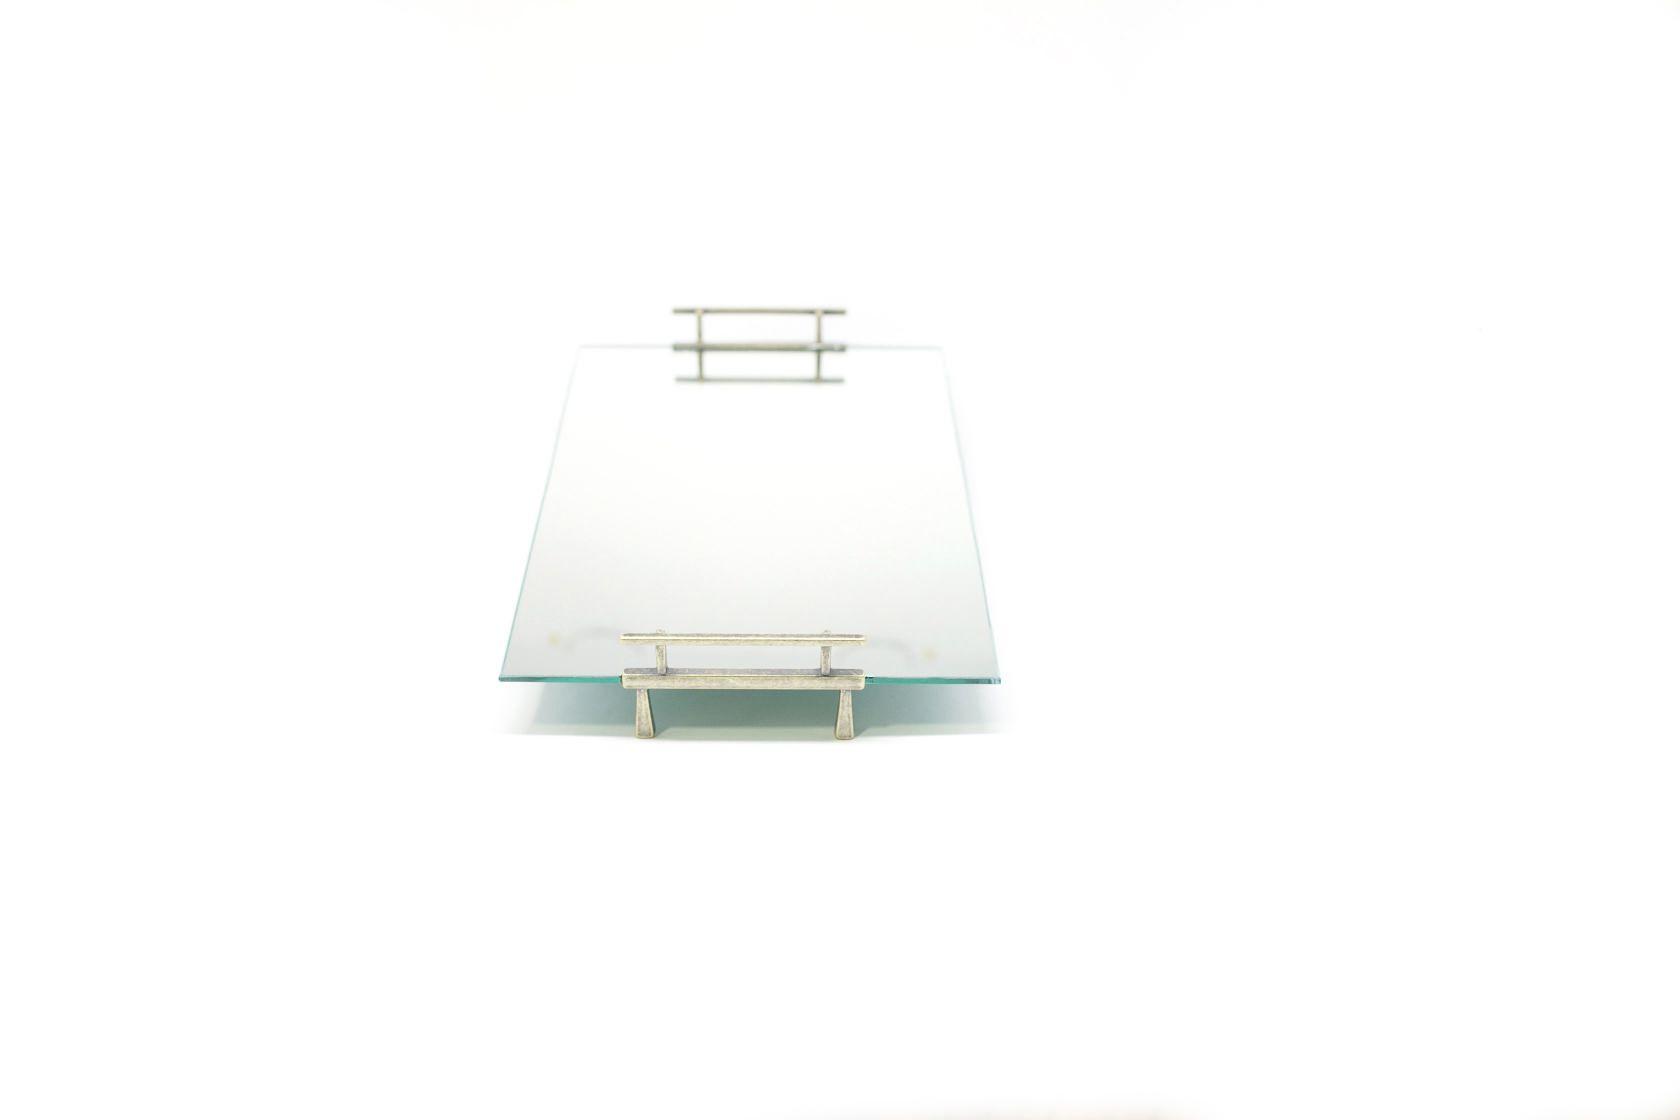 Bandeja Espelhada Alça Lateral Prata 30x20